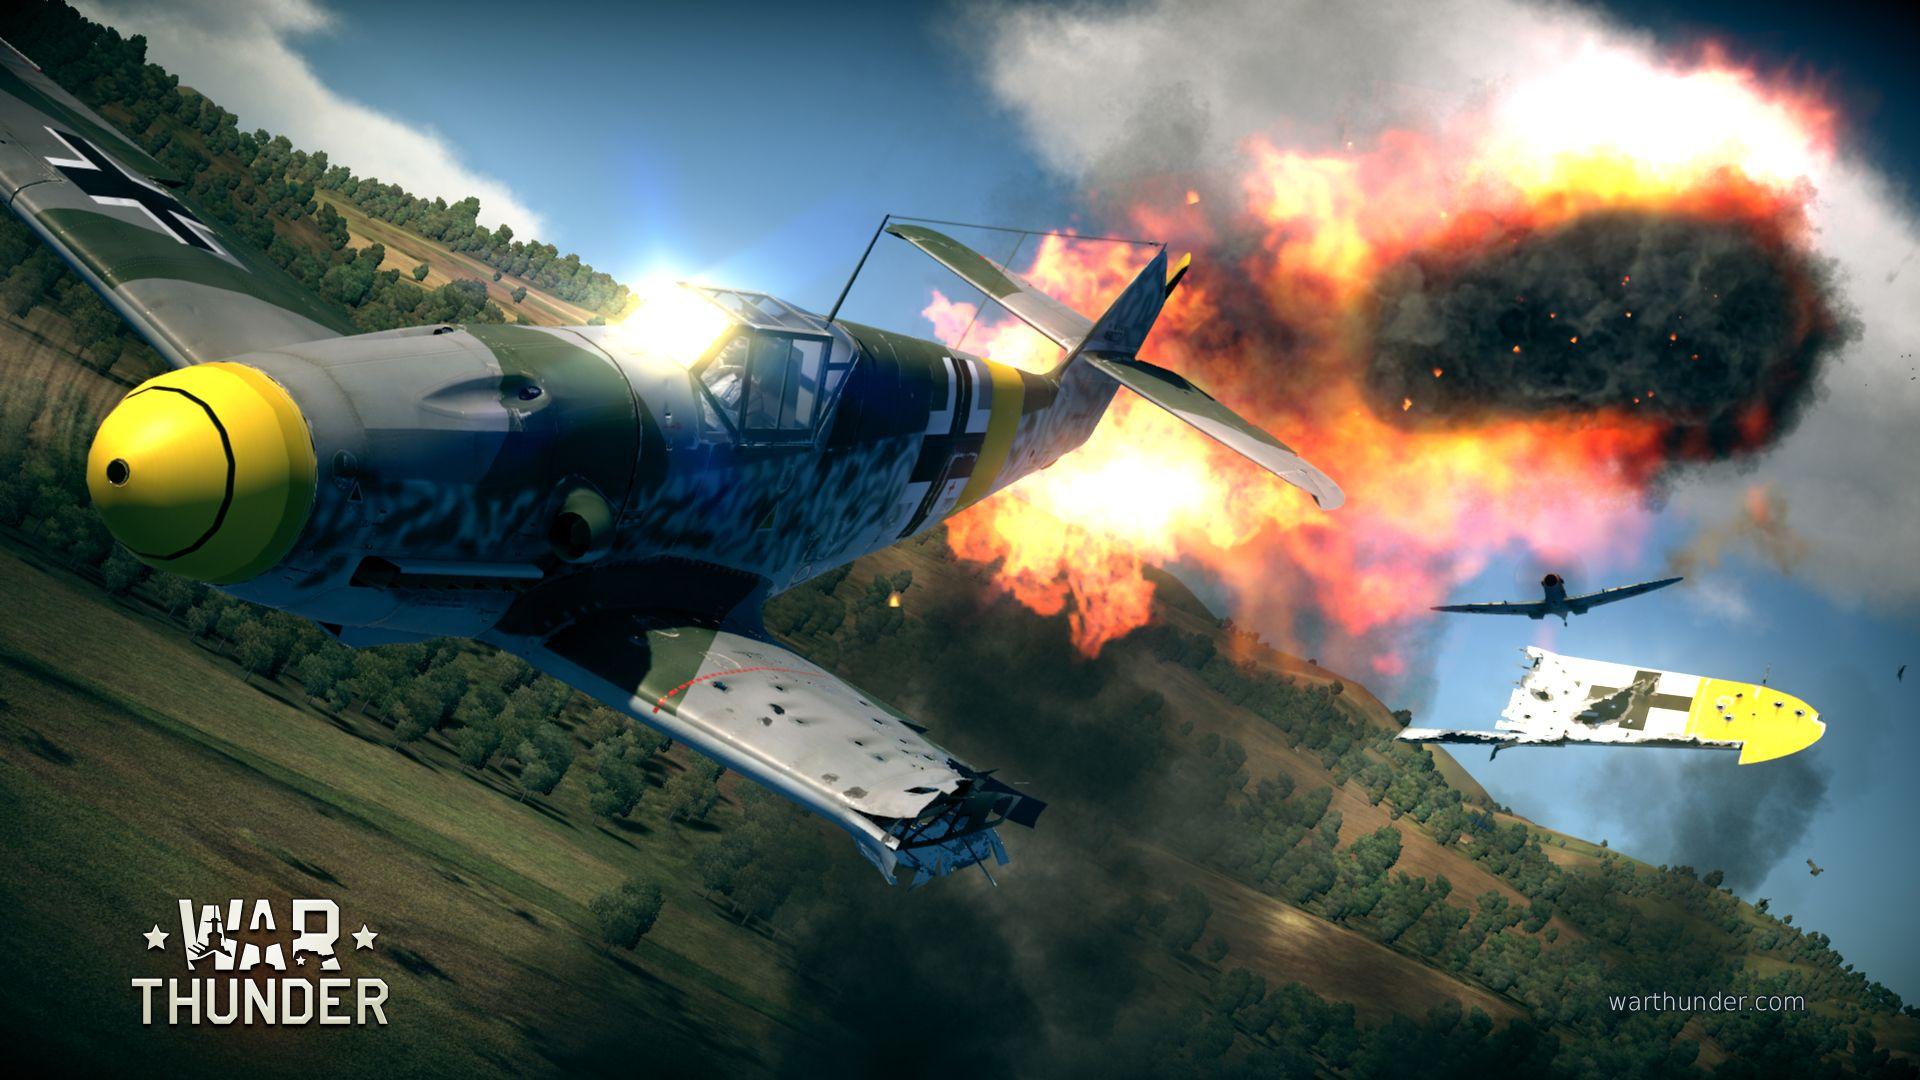 War thunder 2013 gameplay